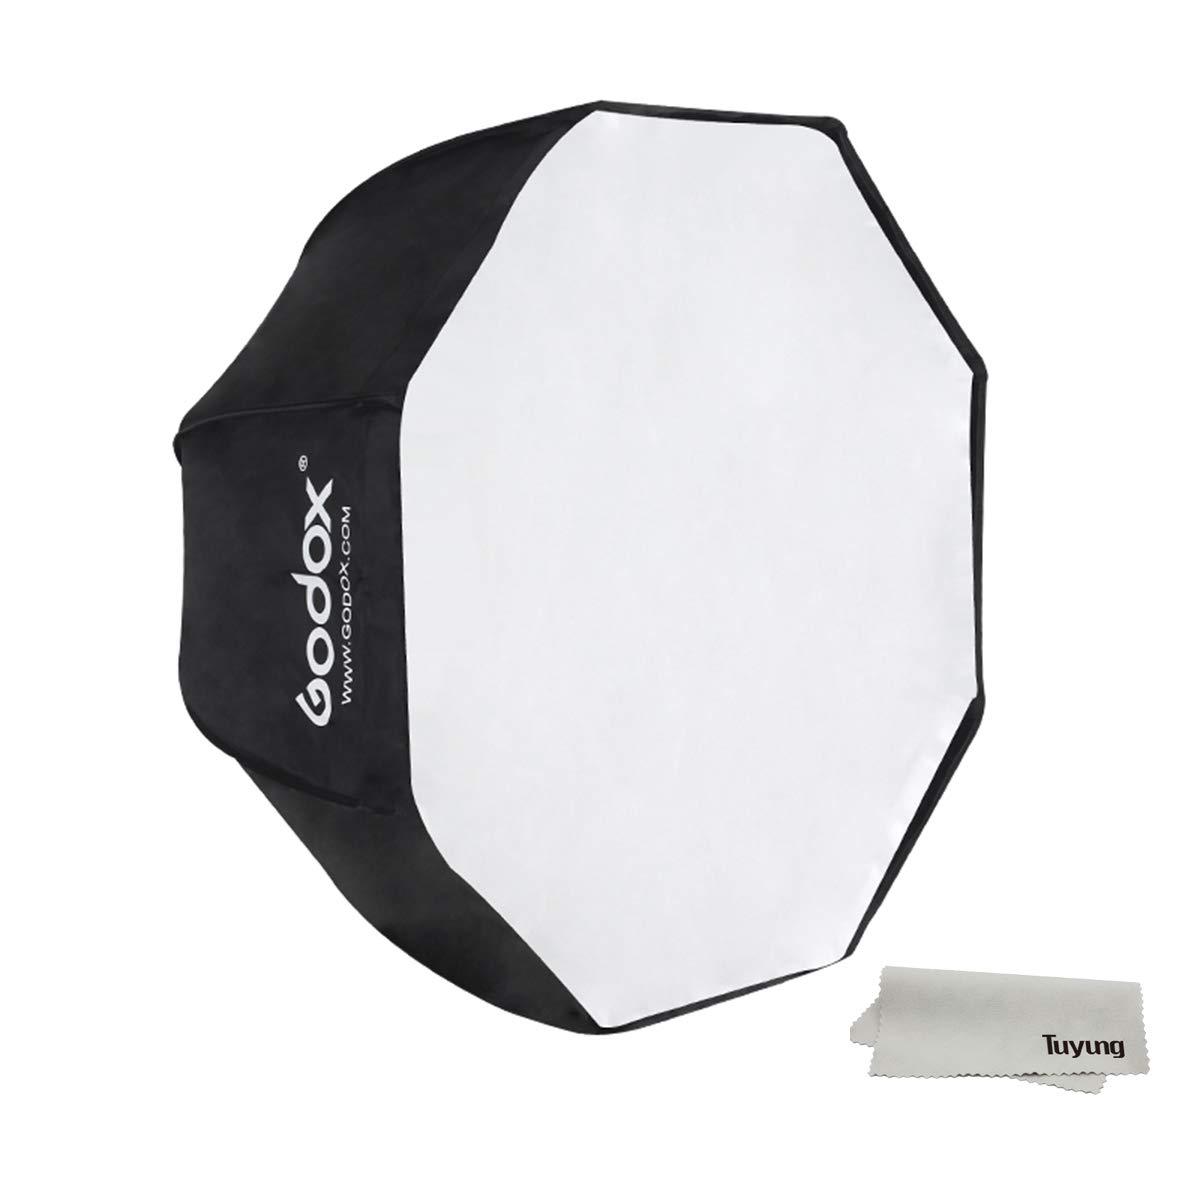 Godox Portable 95cm/37.5'' Umbrella Octagon Softbox Reflector with Carrying Bag for Studio Photo Flash Speedlight by Godox (Image #1)